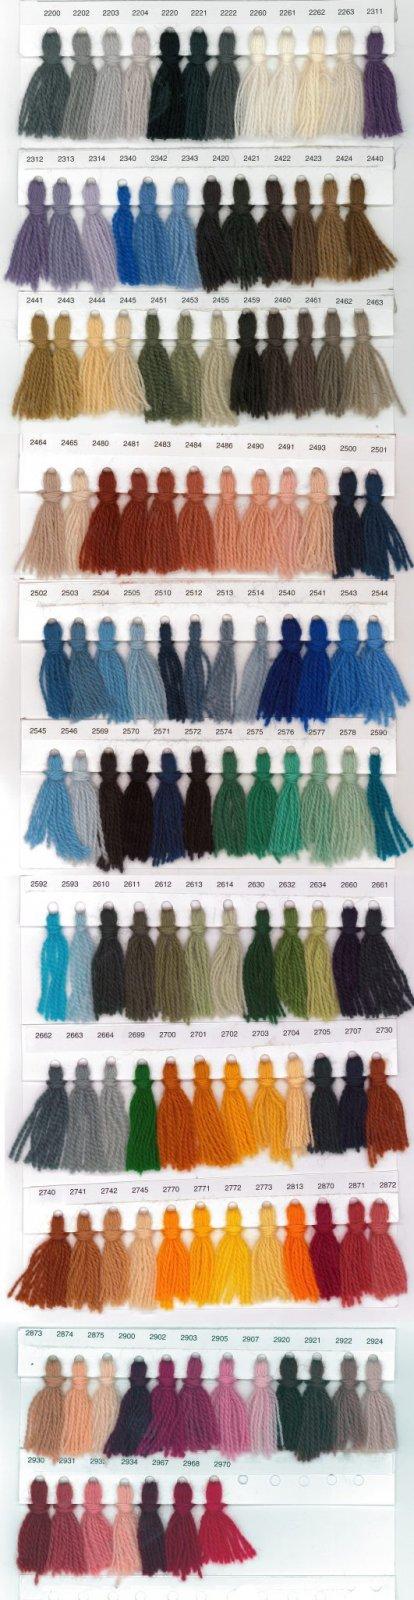 Anahera wool small skein